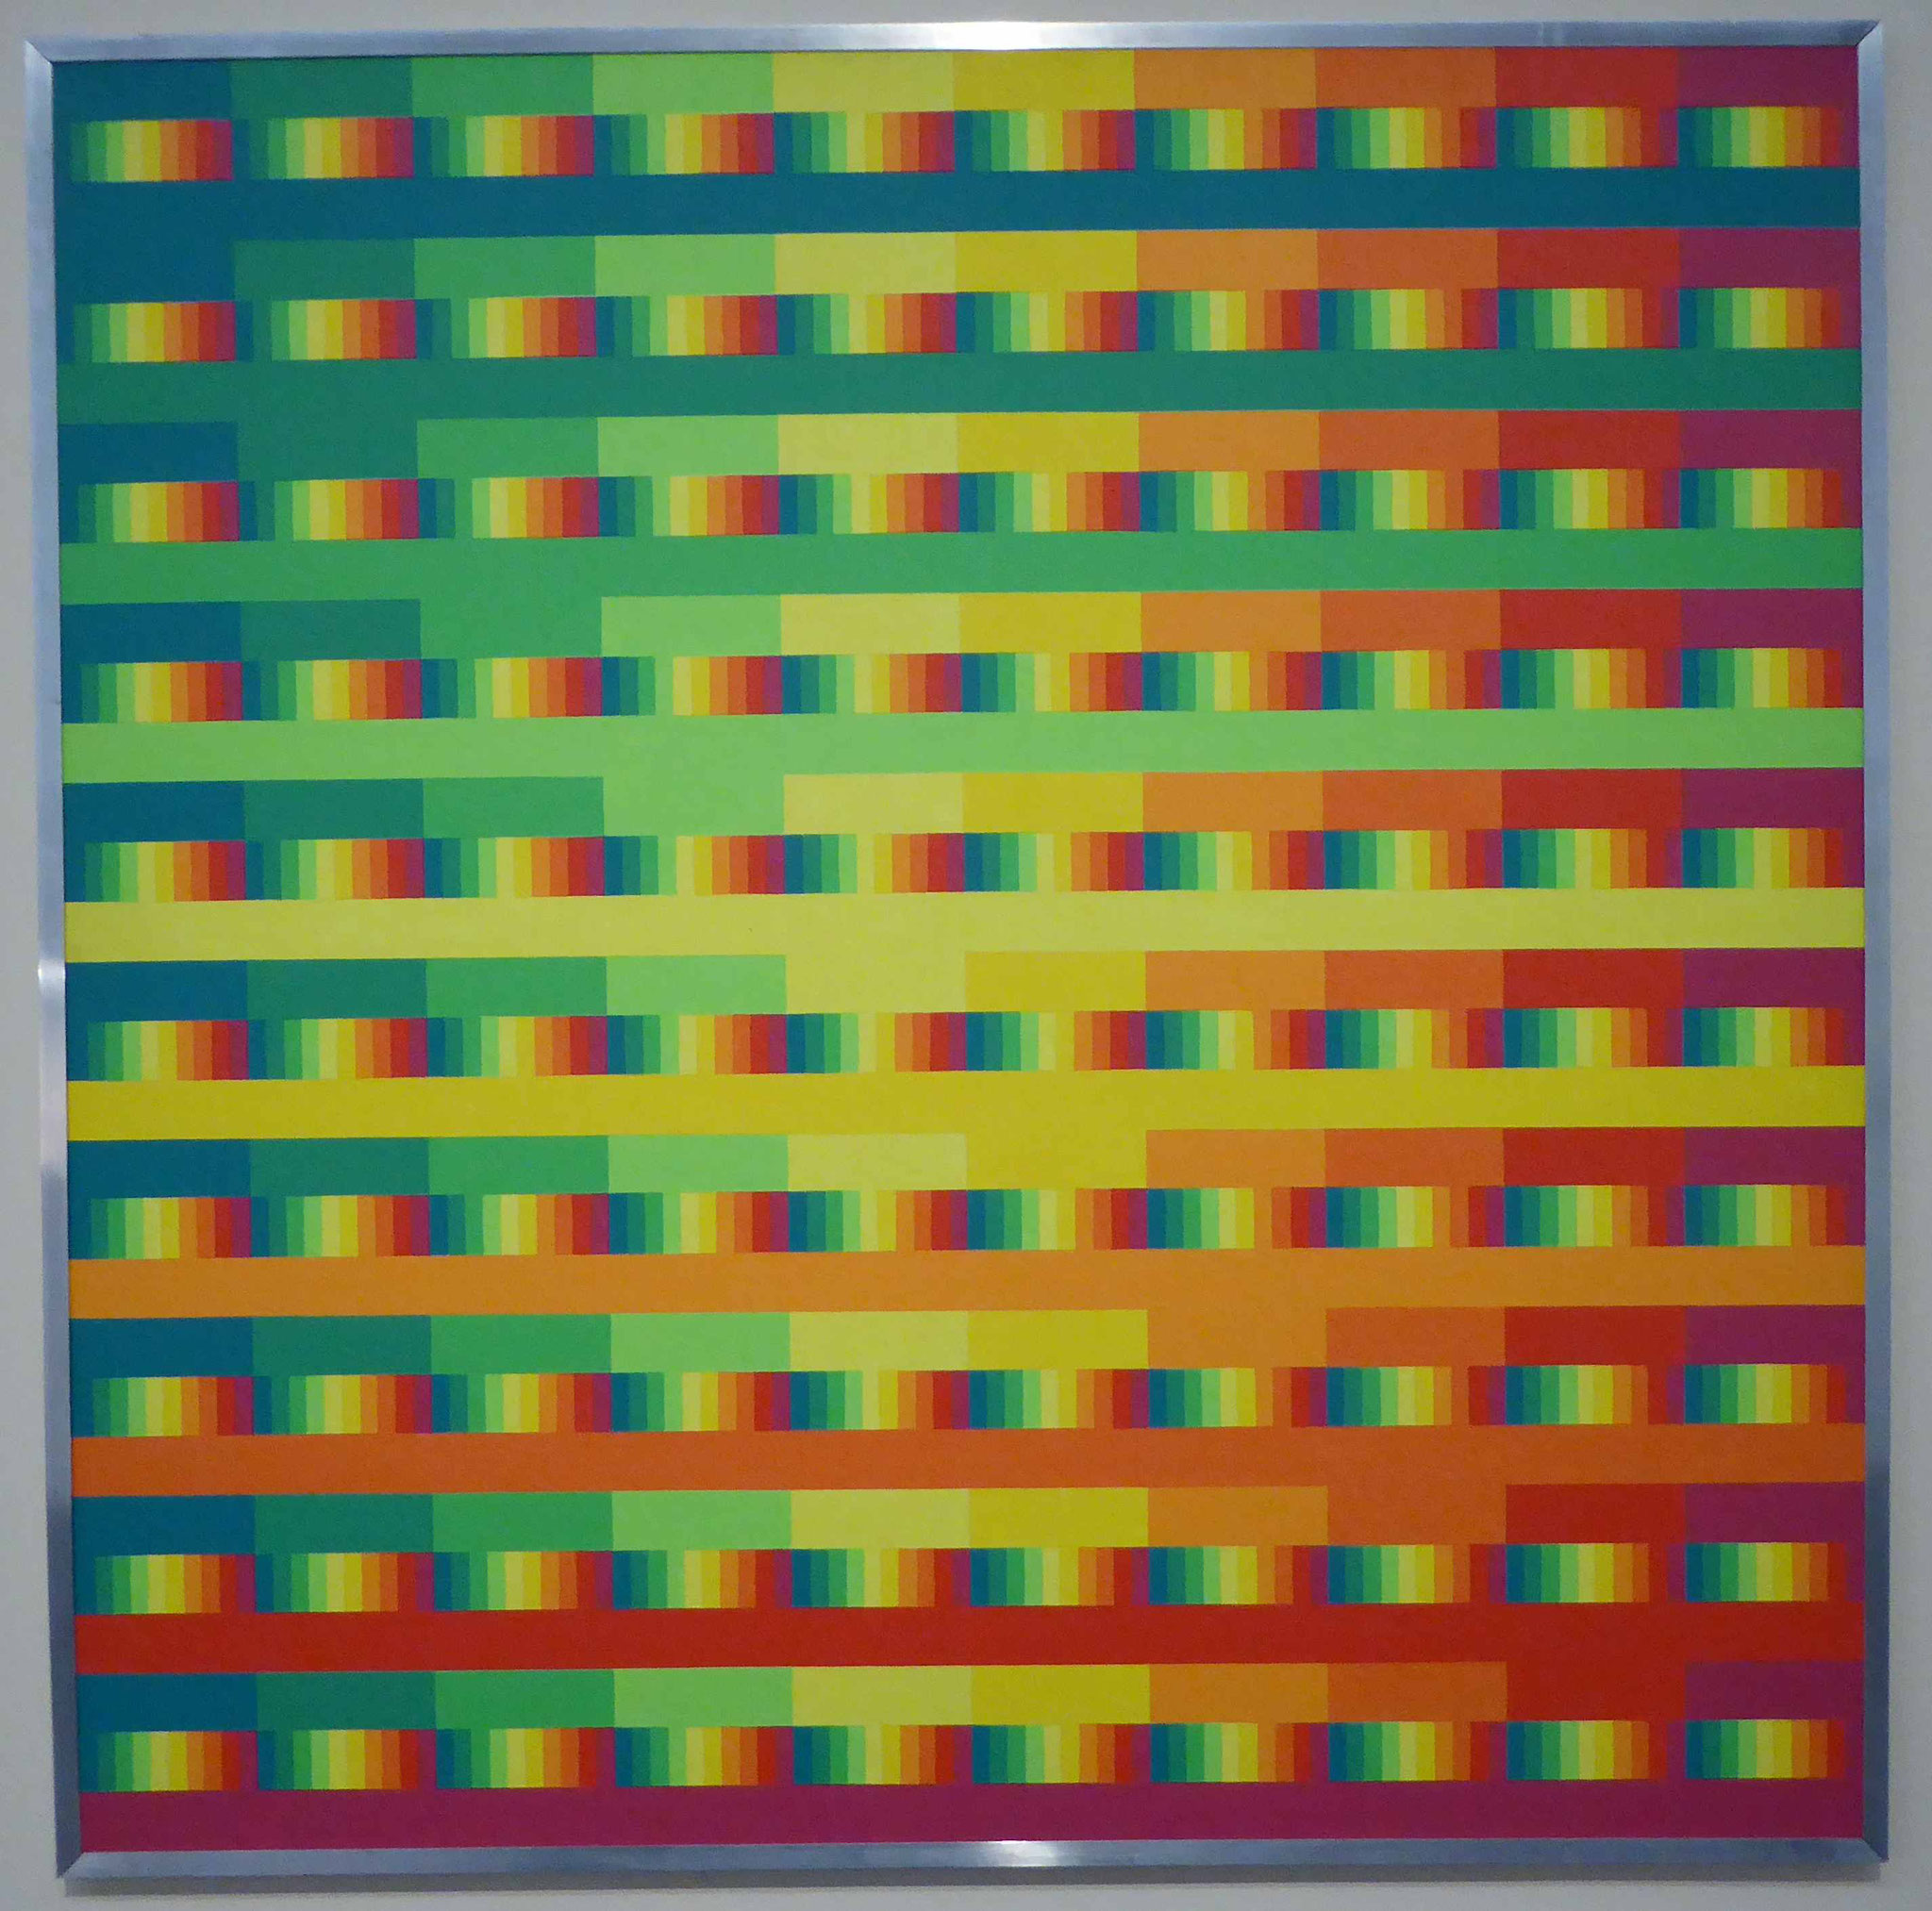 Hans Bartnig,  Komposition in zehn Farben  000 - 999, 1979, Museum Moritzburg, Halle